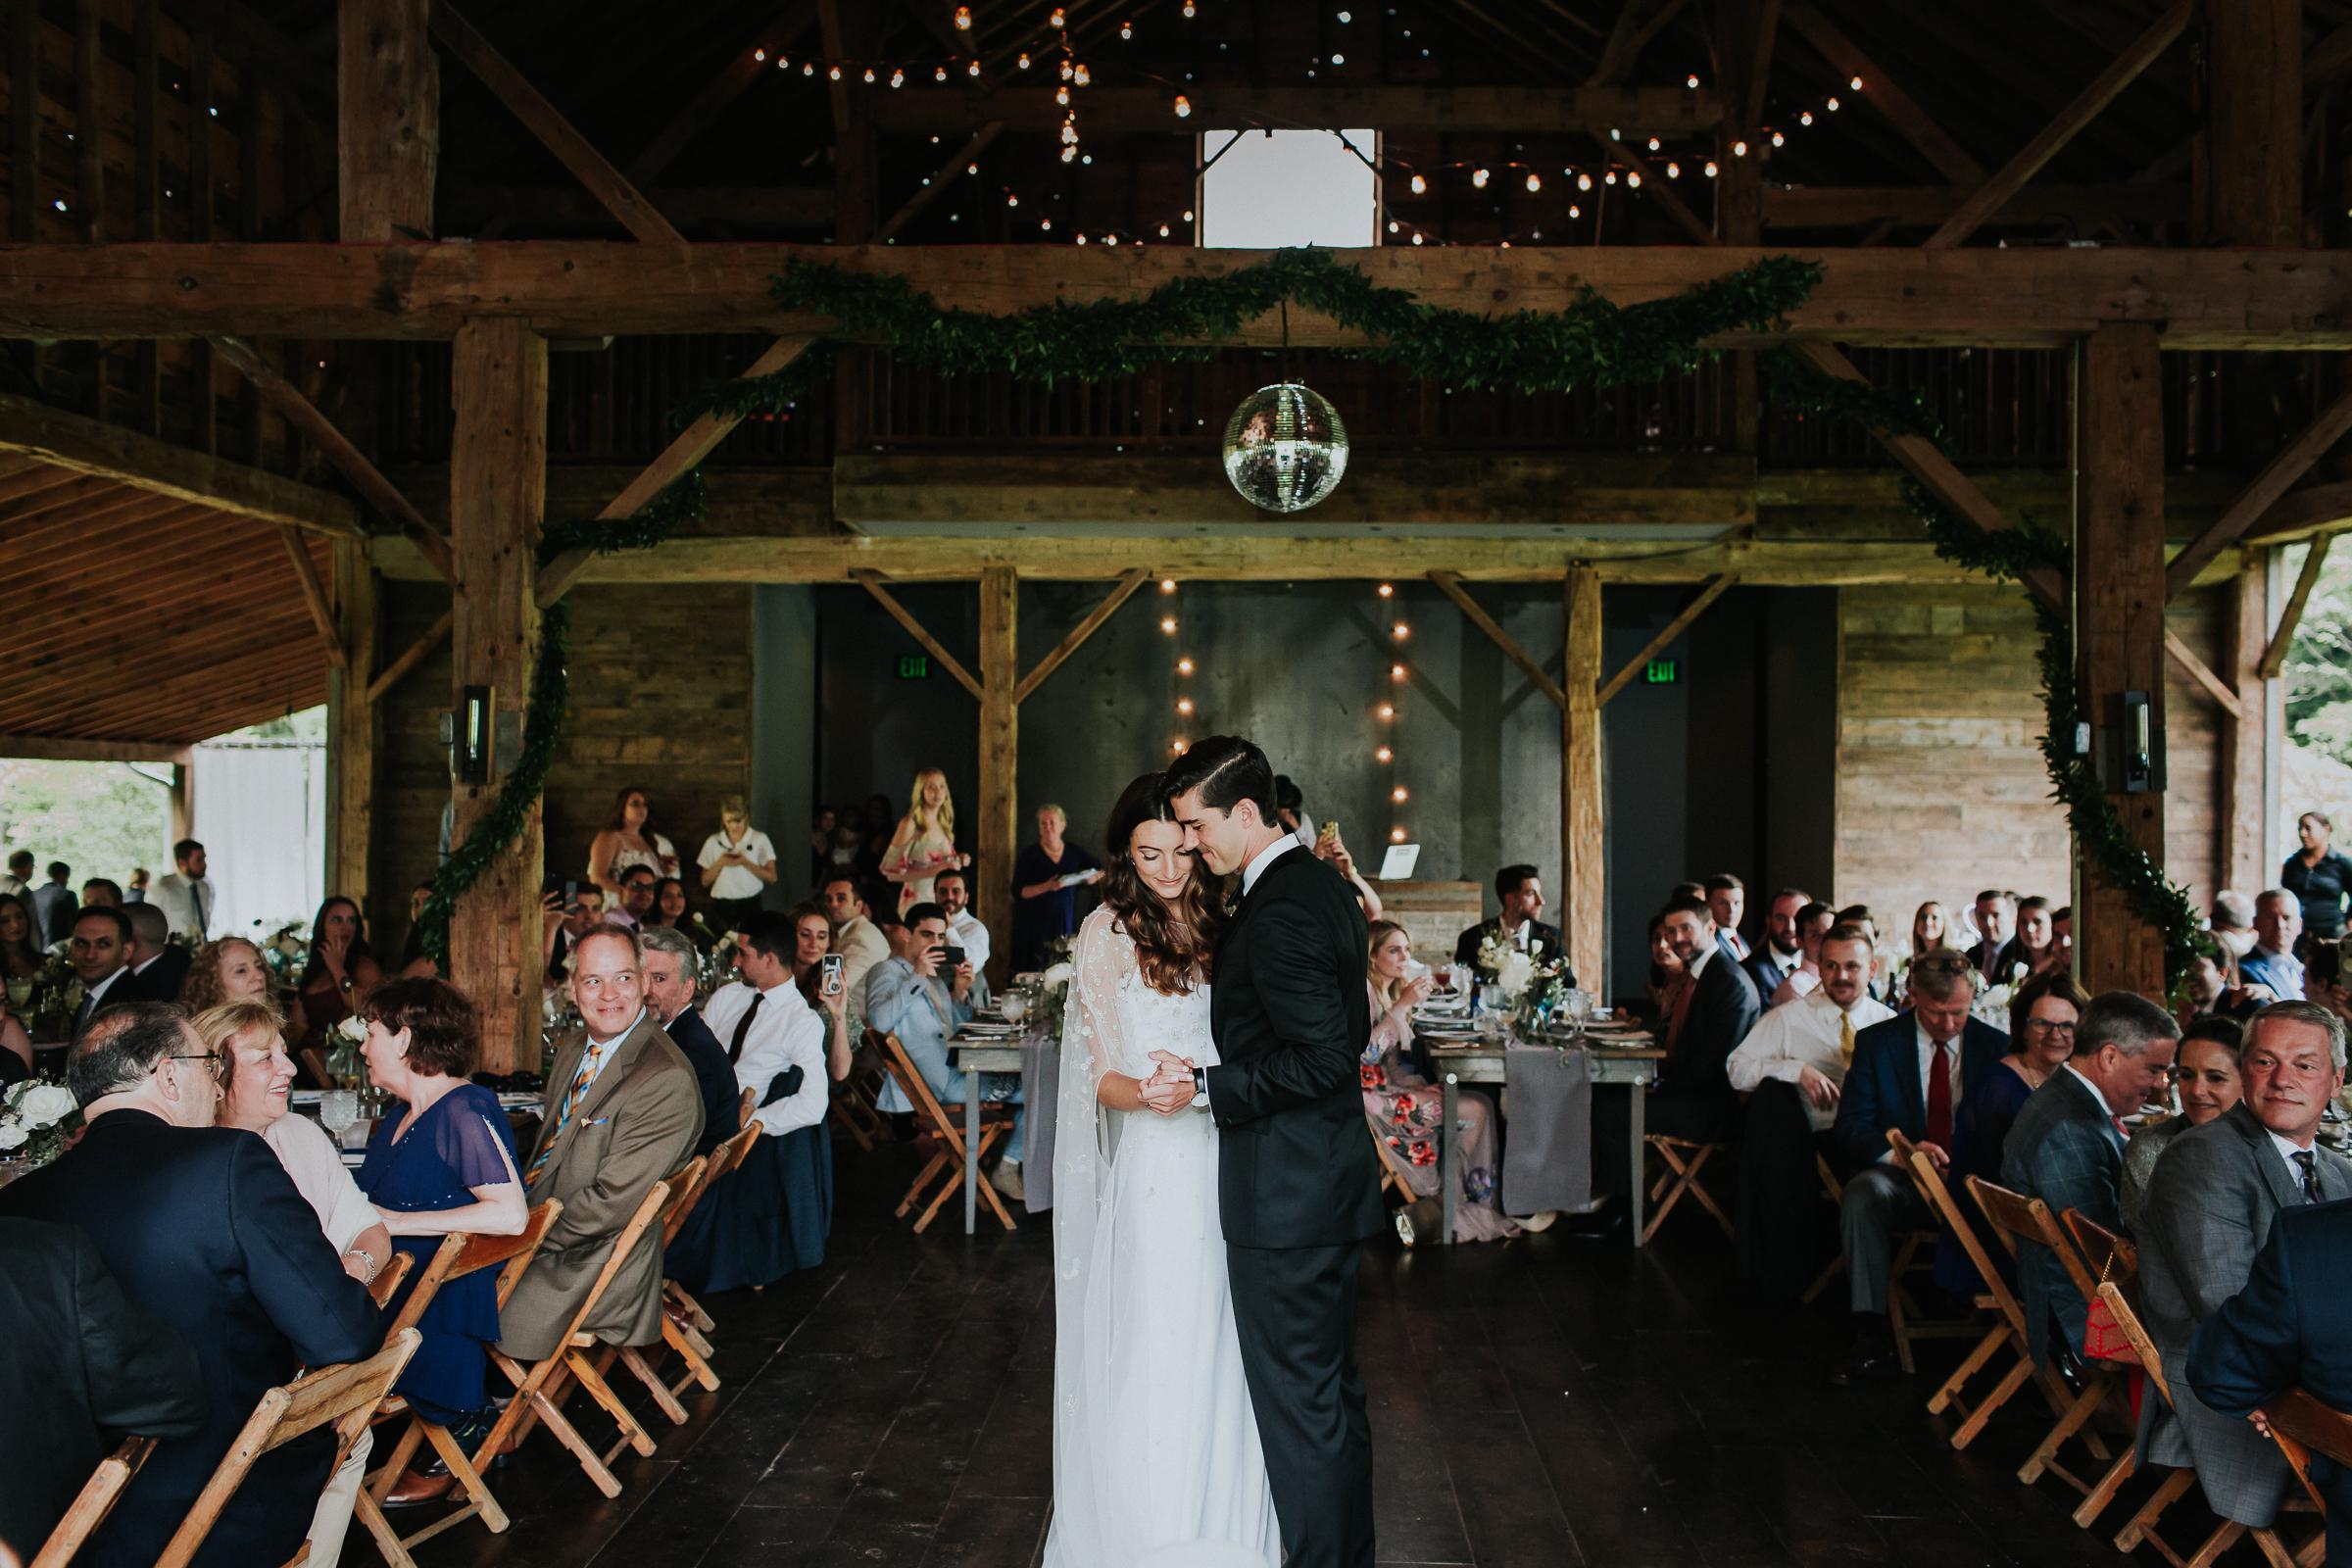 Handsome-Hollow-Long-Eddy-Catskills-New-York-Fine-Art-Documentary-Wedding-Photographer-101.jpg